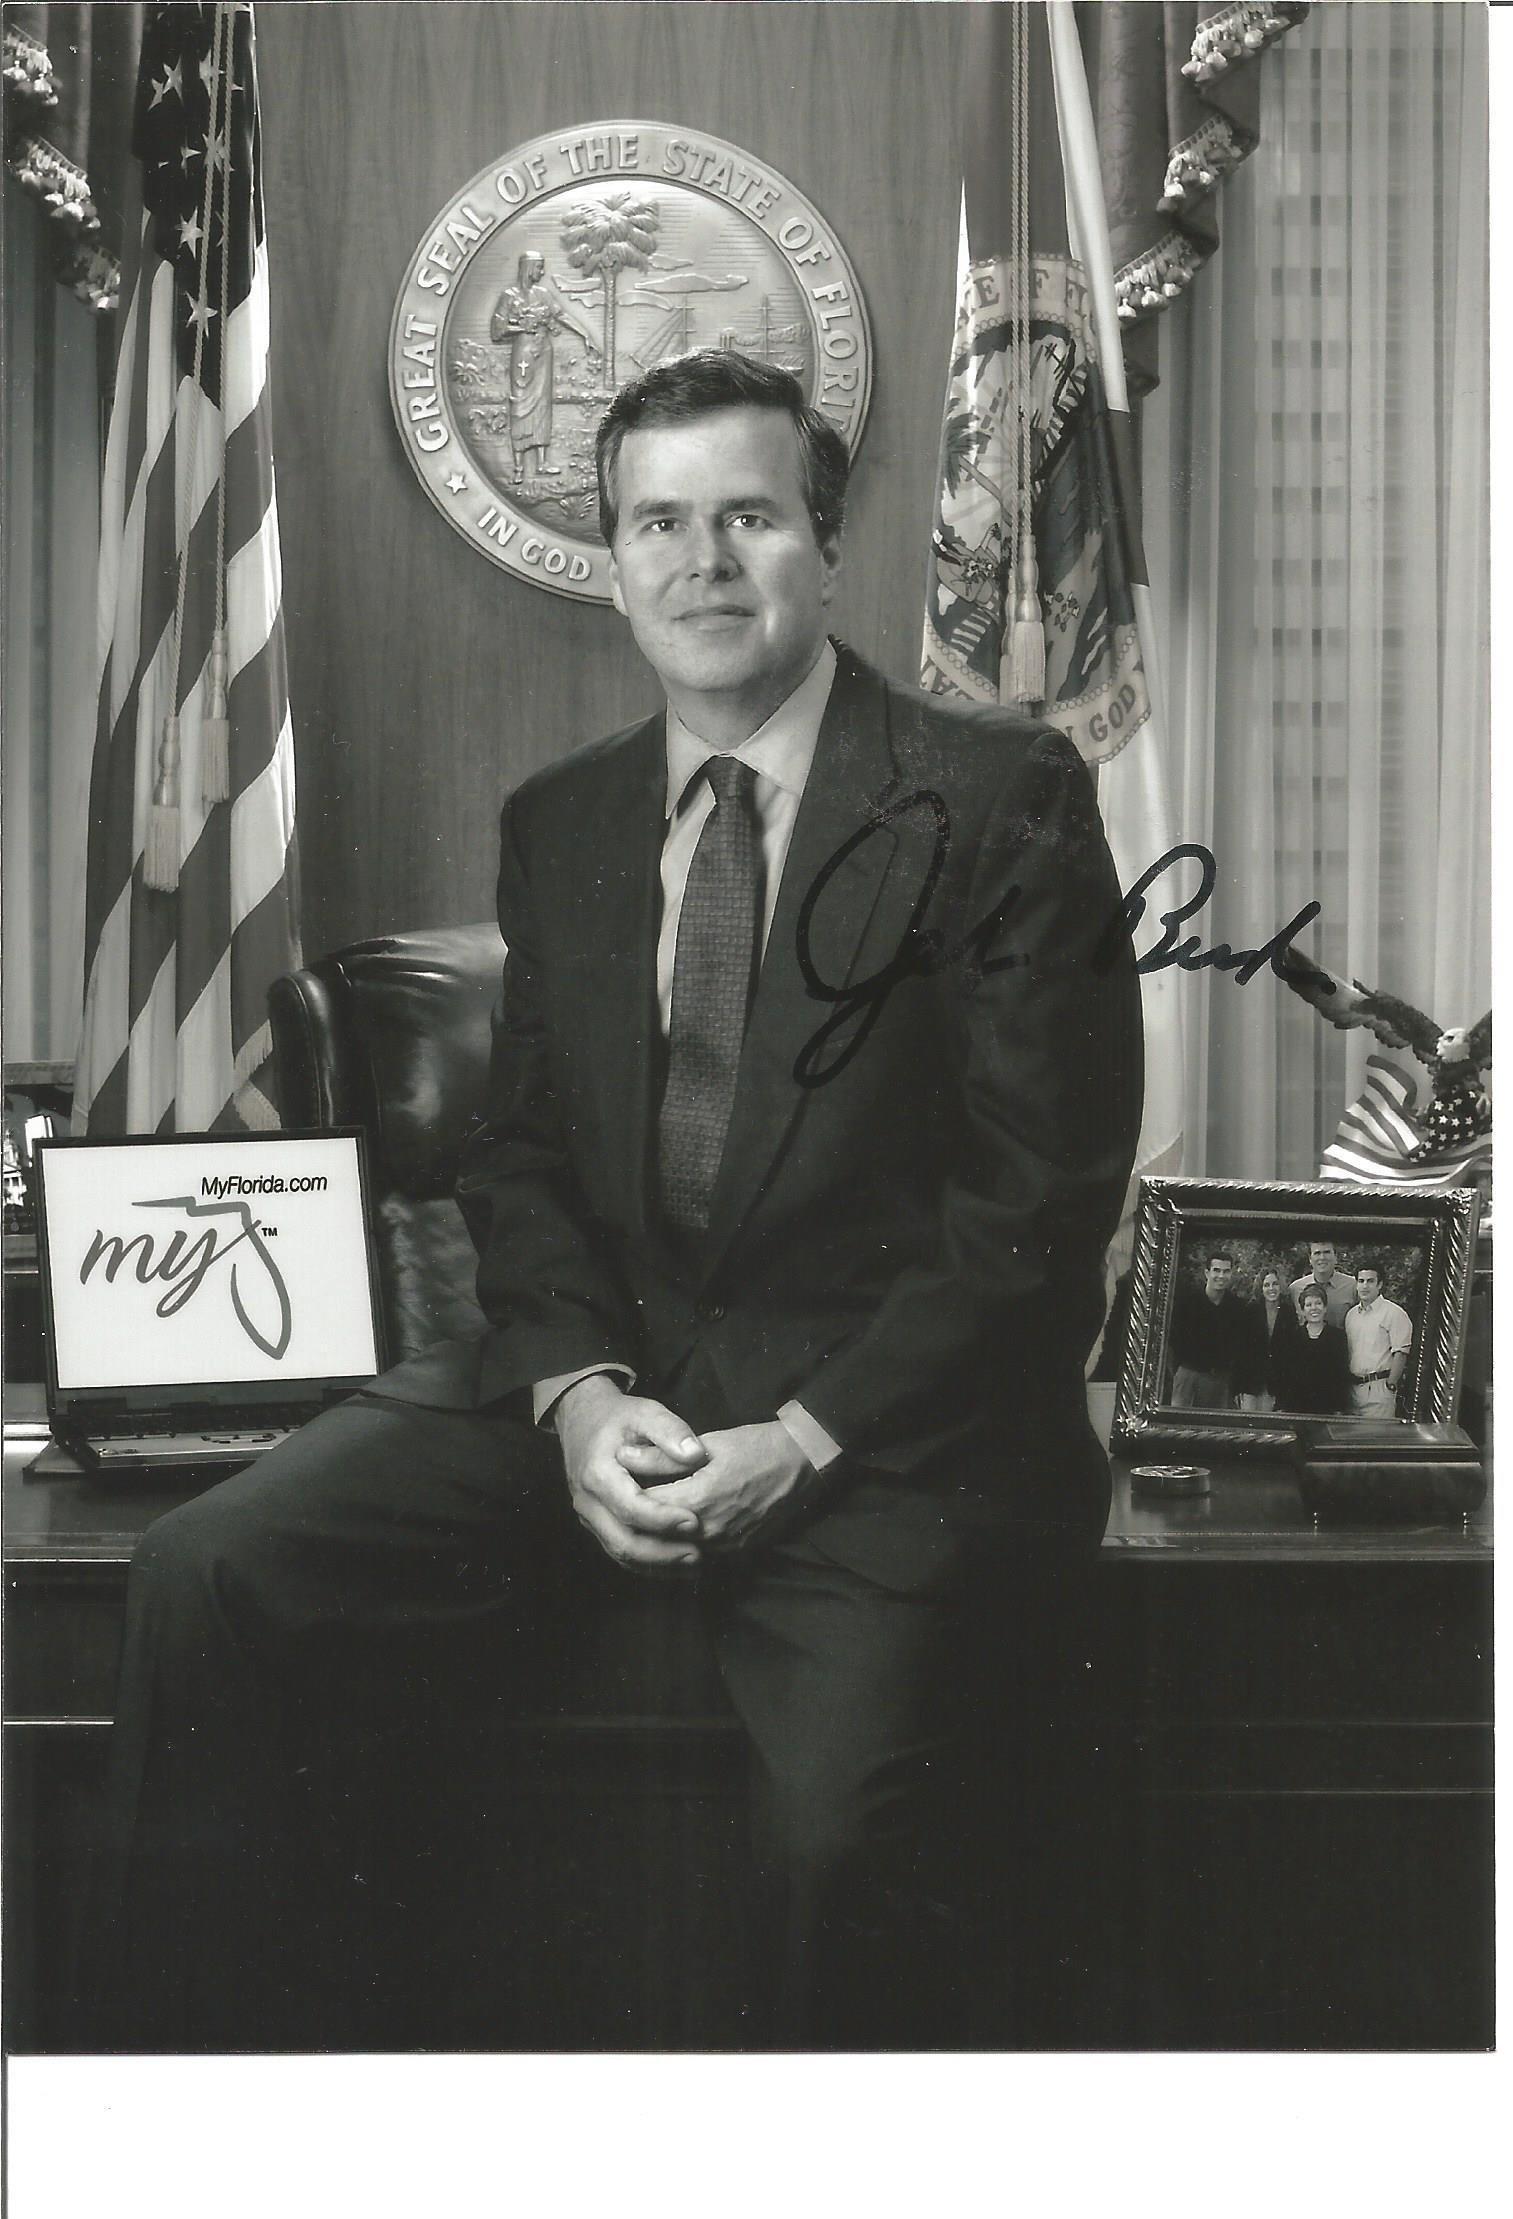 Jeb Bush signed 7x5 black and white photo. Good